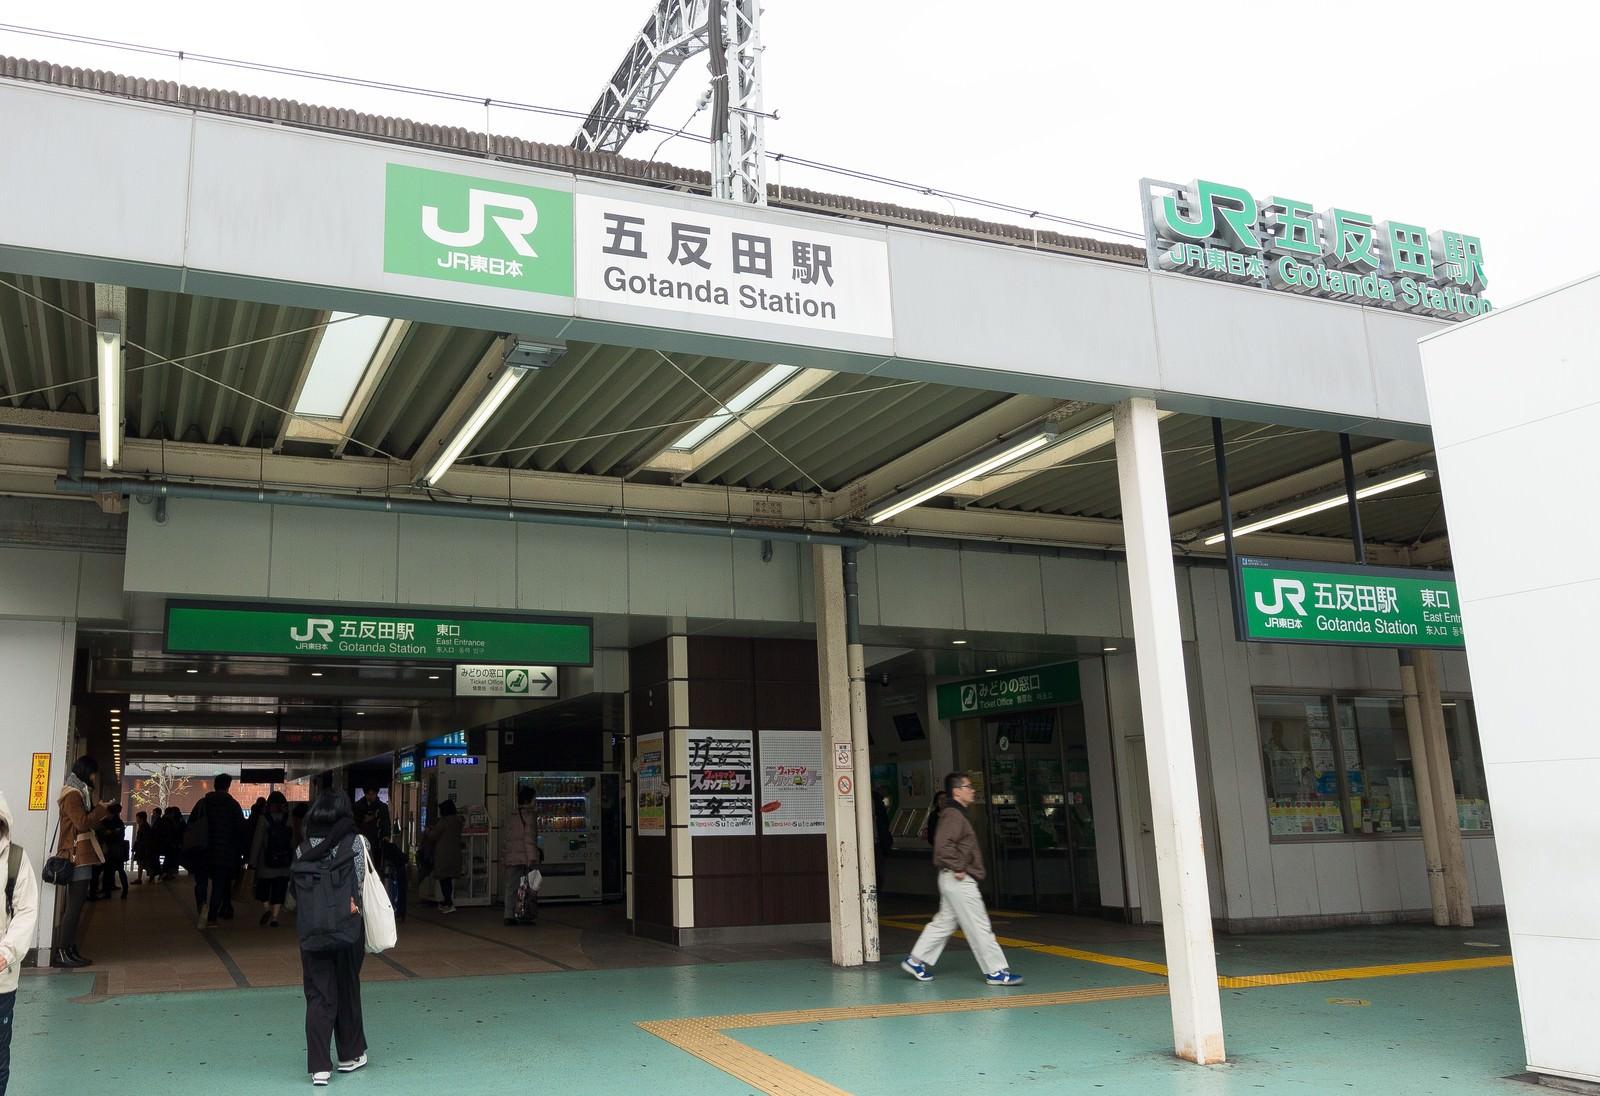 gotanda037011607_TP_V 大崎・五反田・目黒でスマホ修理するなら是非当店まで!!